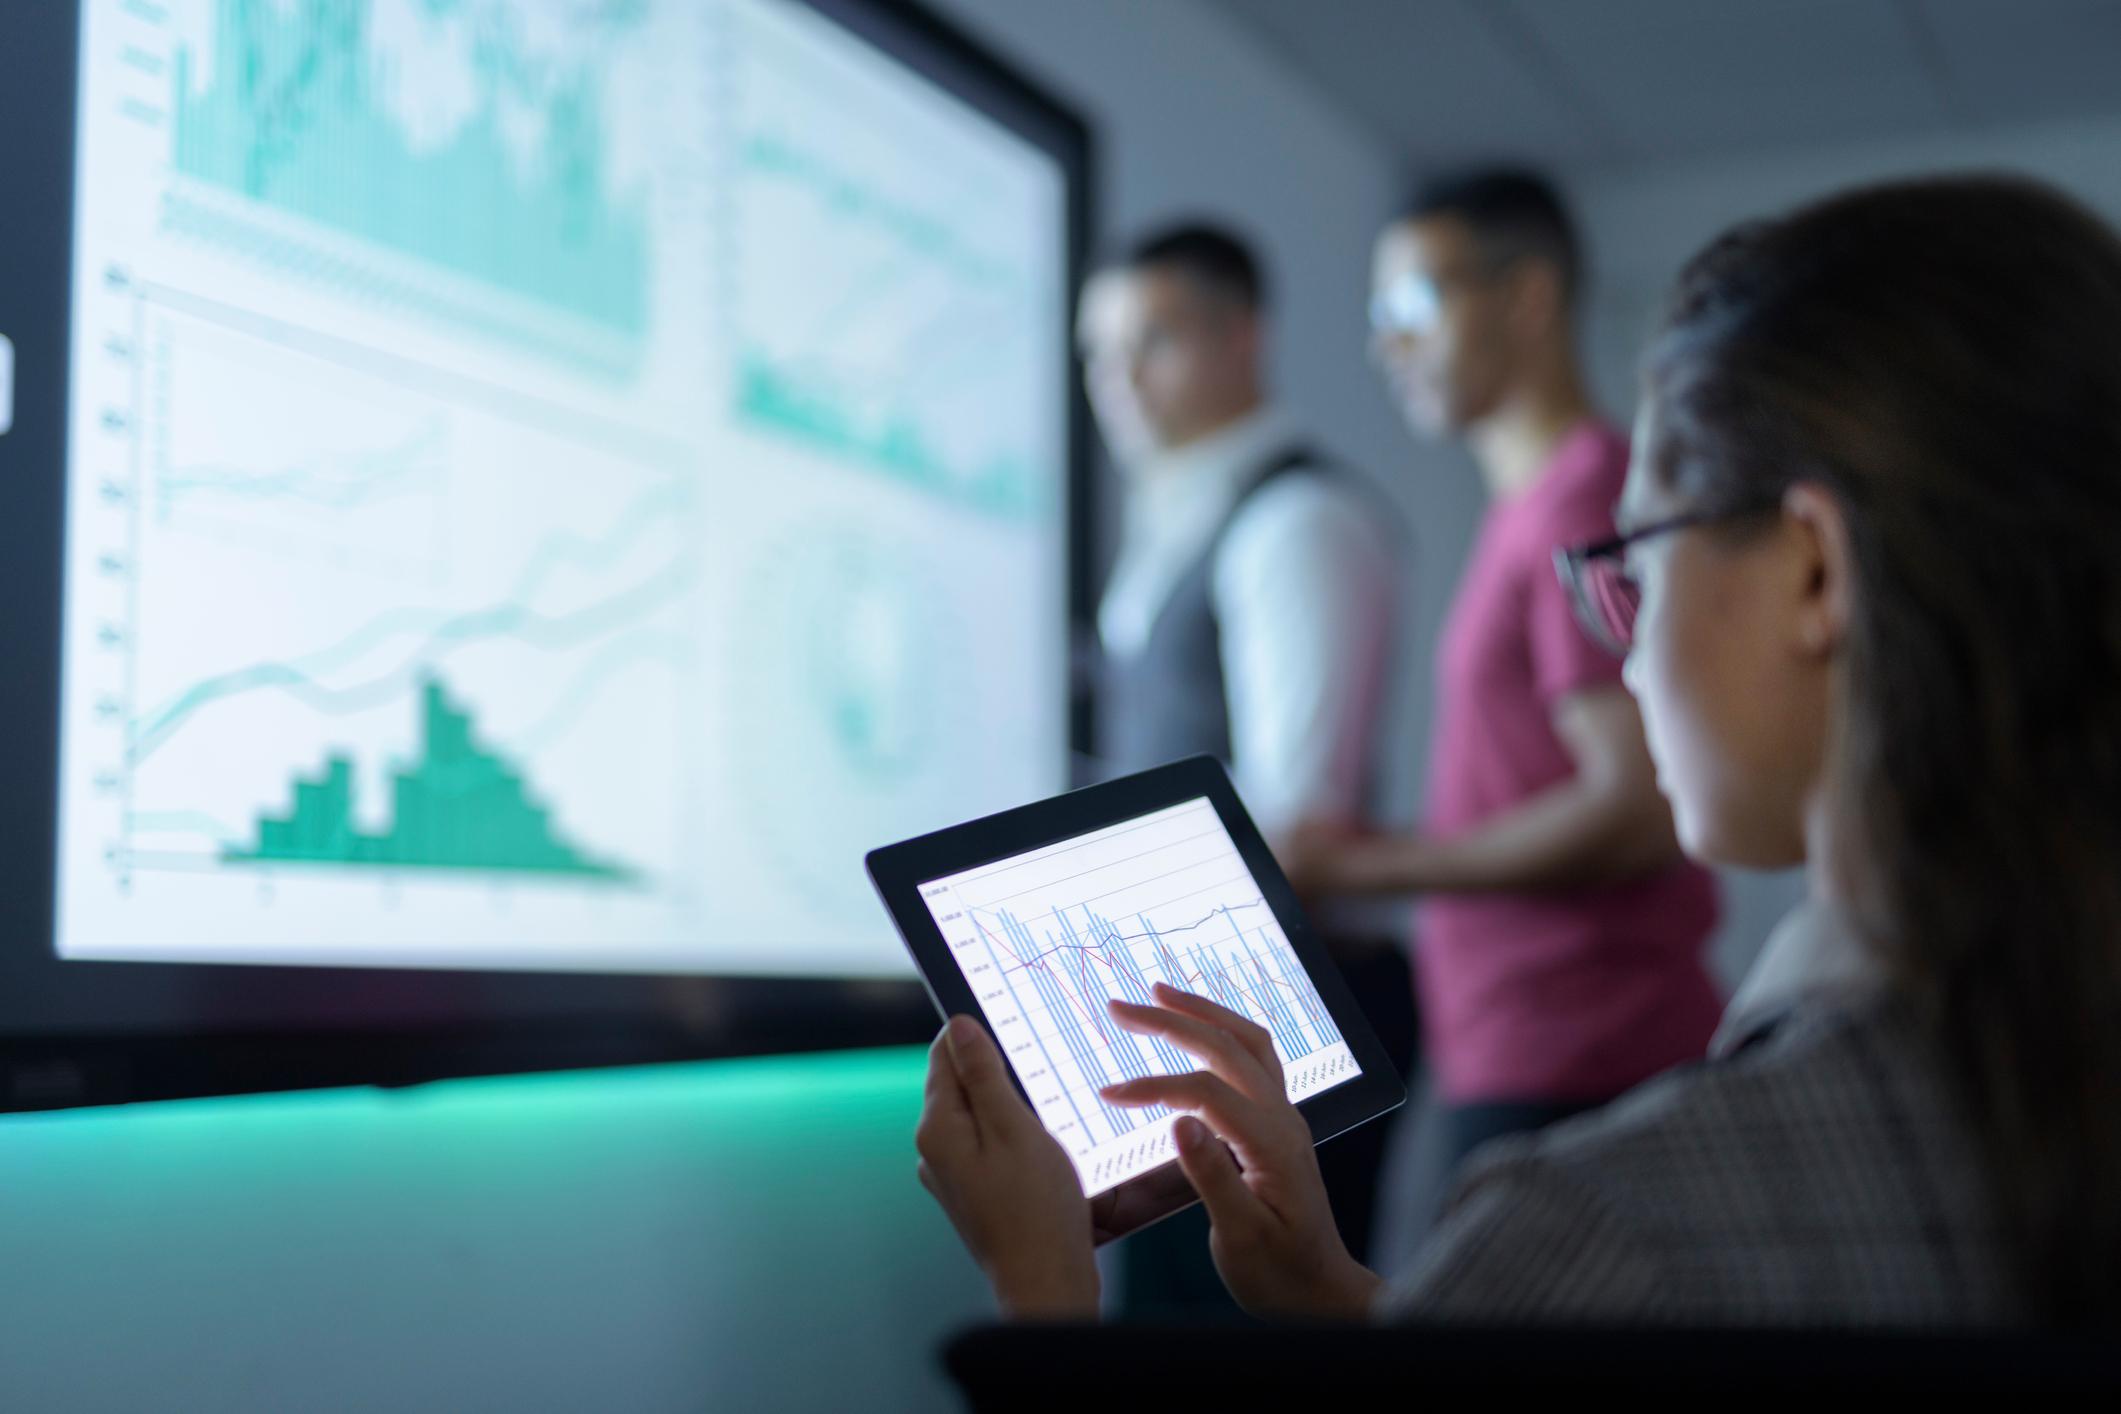 studiosi monitorano dati